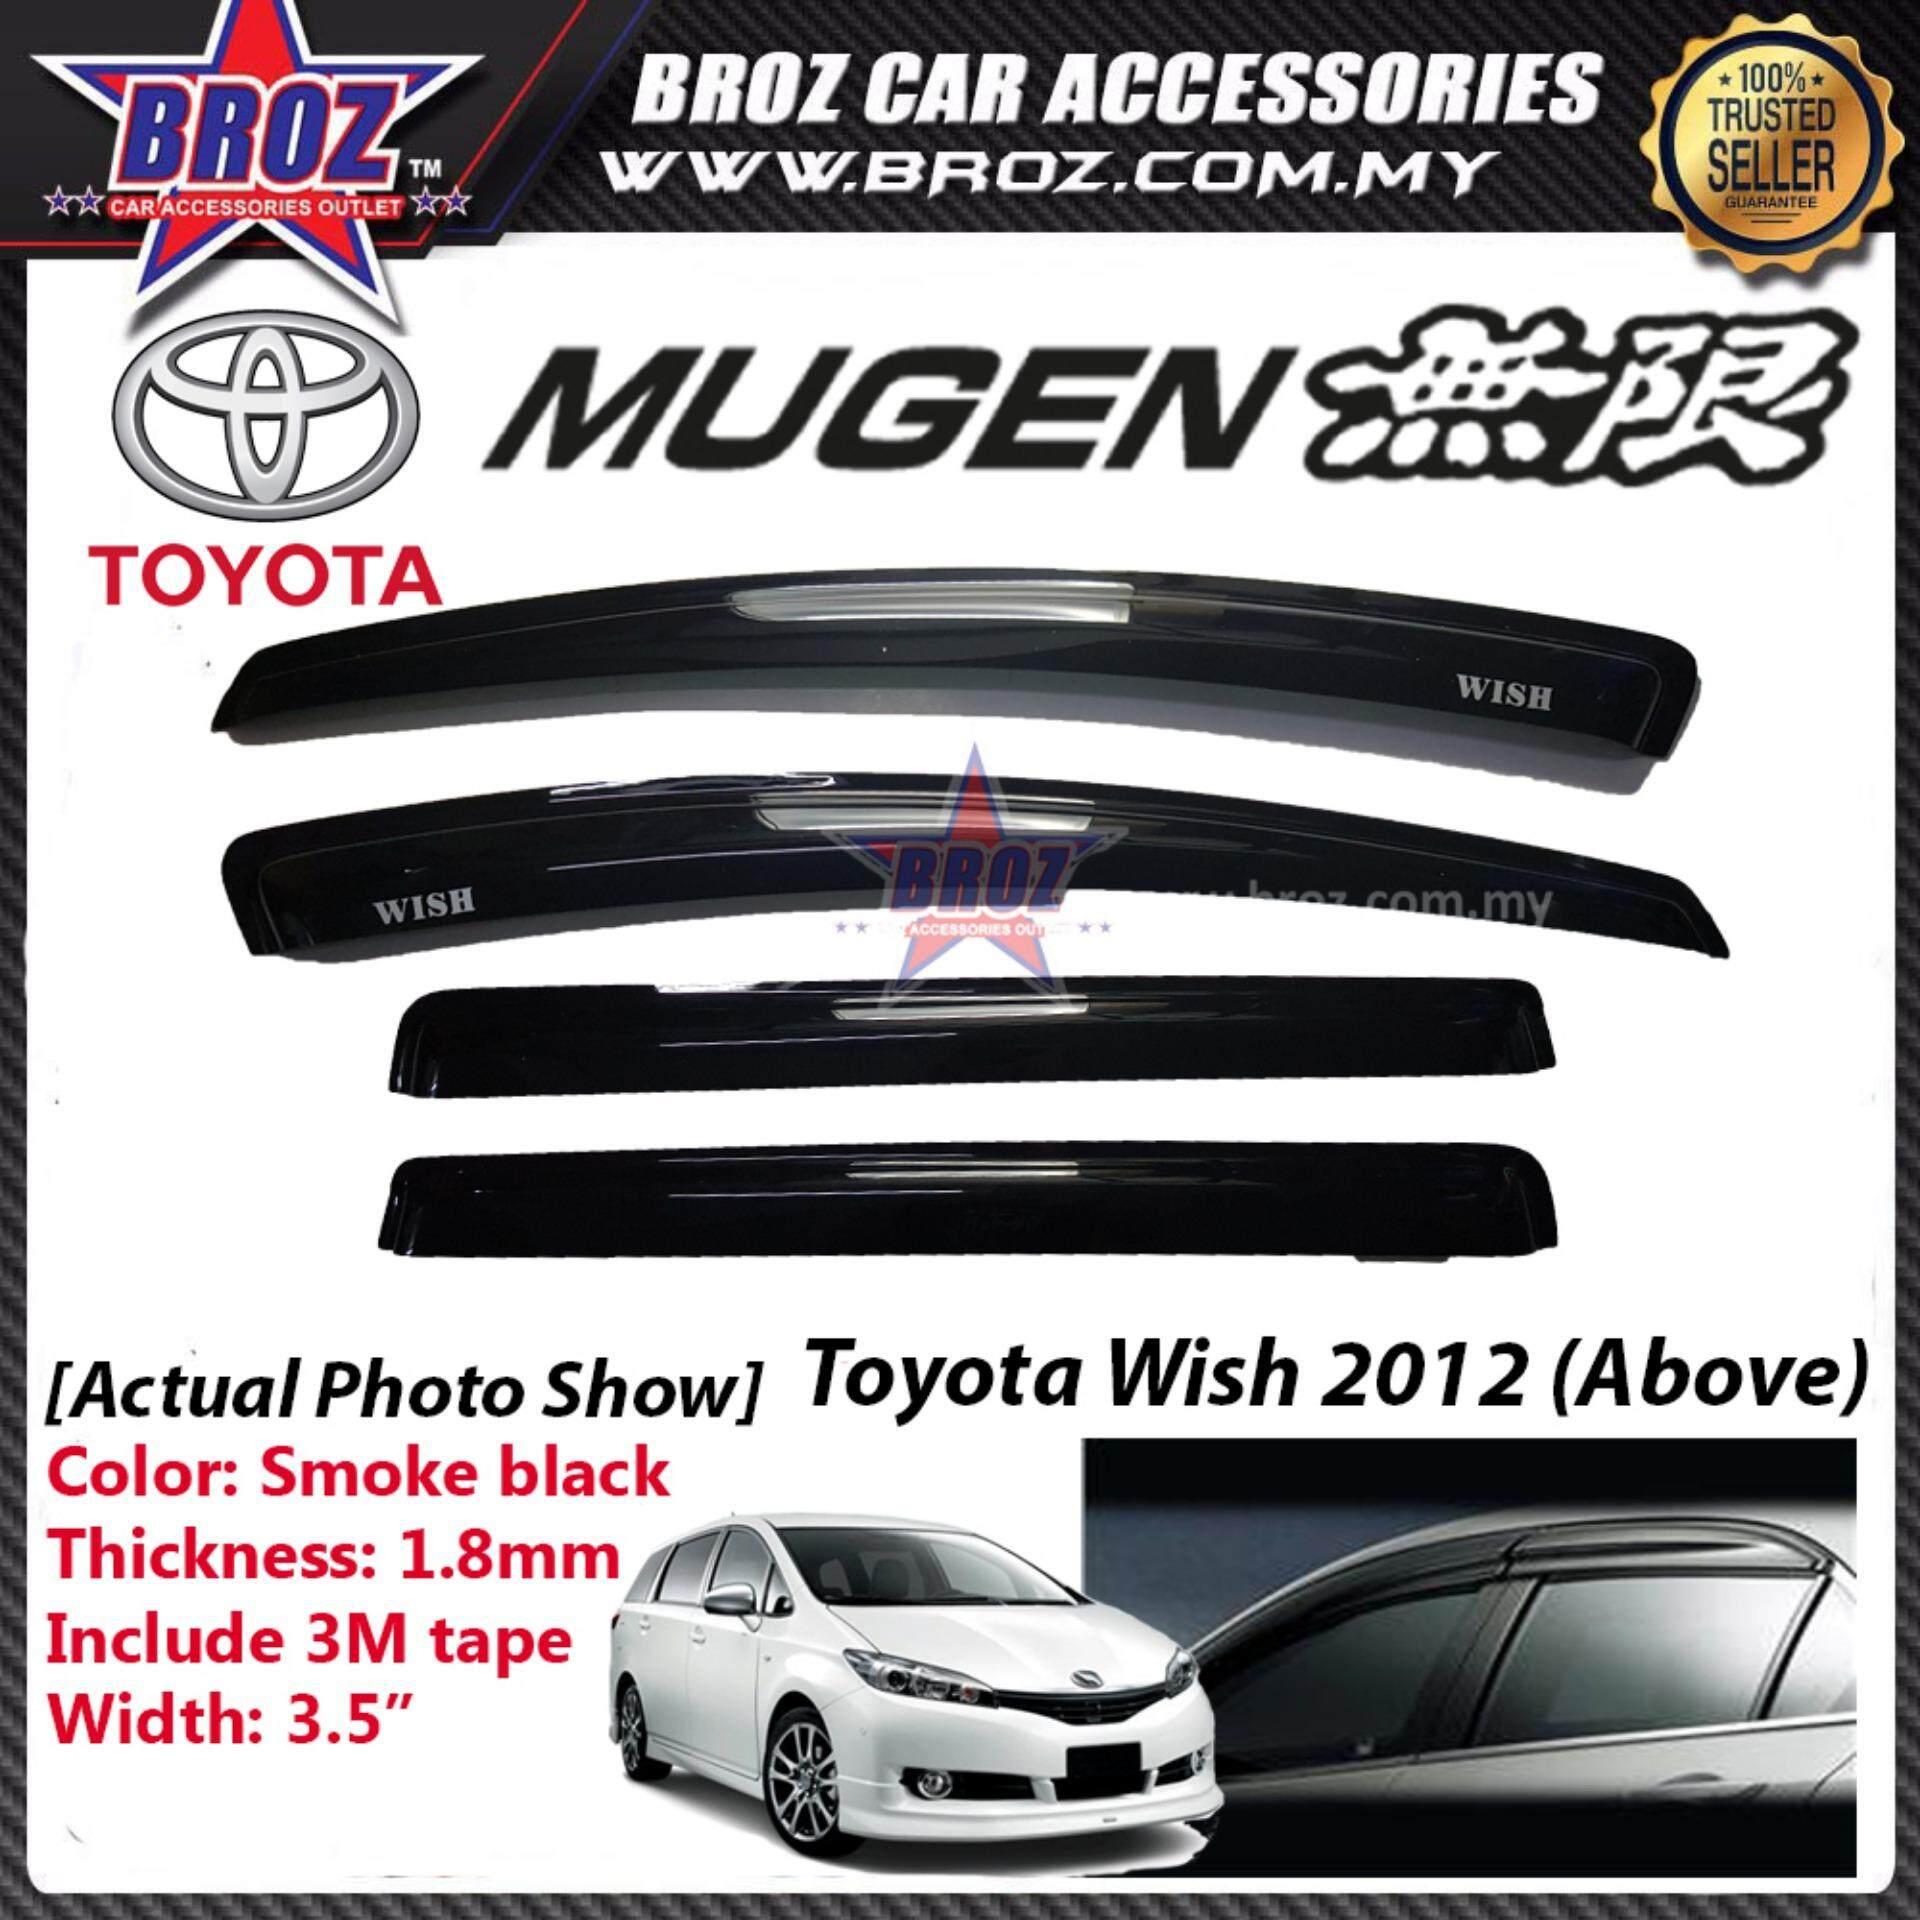 Broz Air Press Window Mugen Style Acrylic Door Visor Wind Deflector 9CM For Toyota Wish 2009-2011 (4PCS/SET)